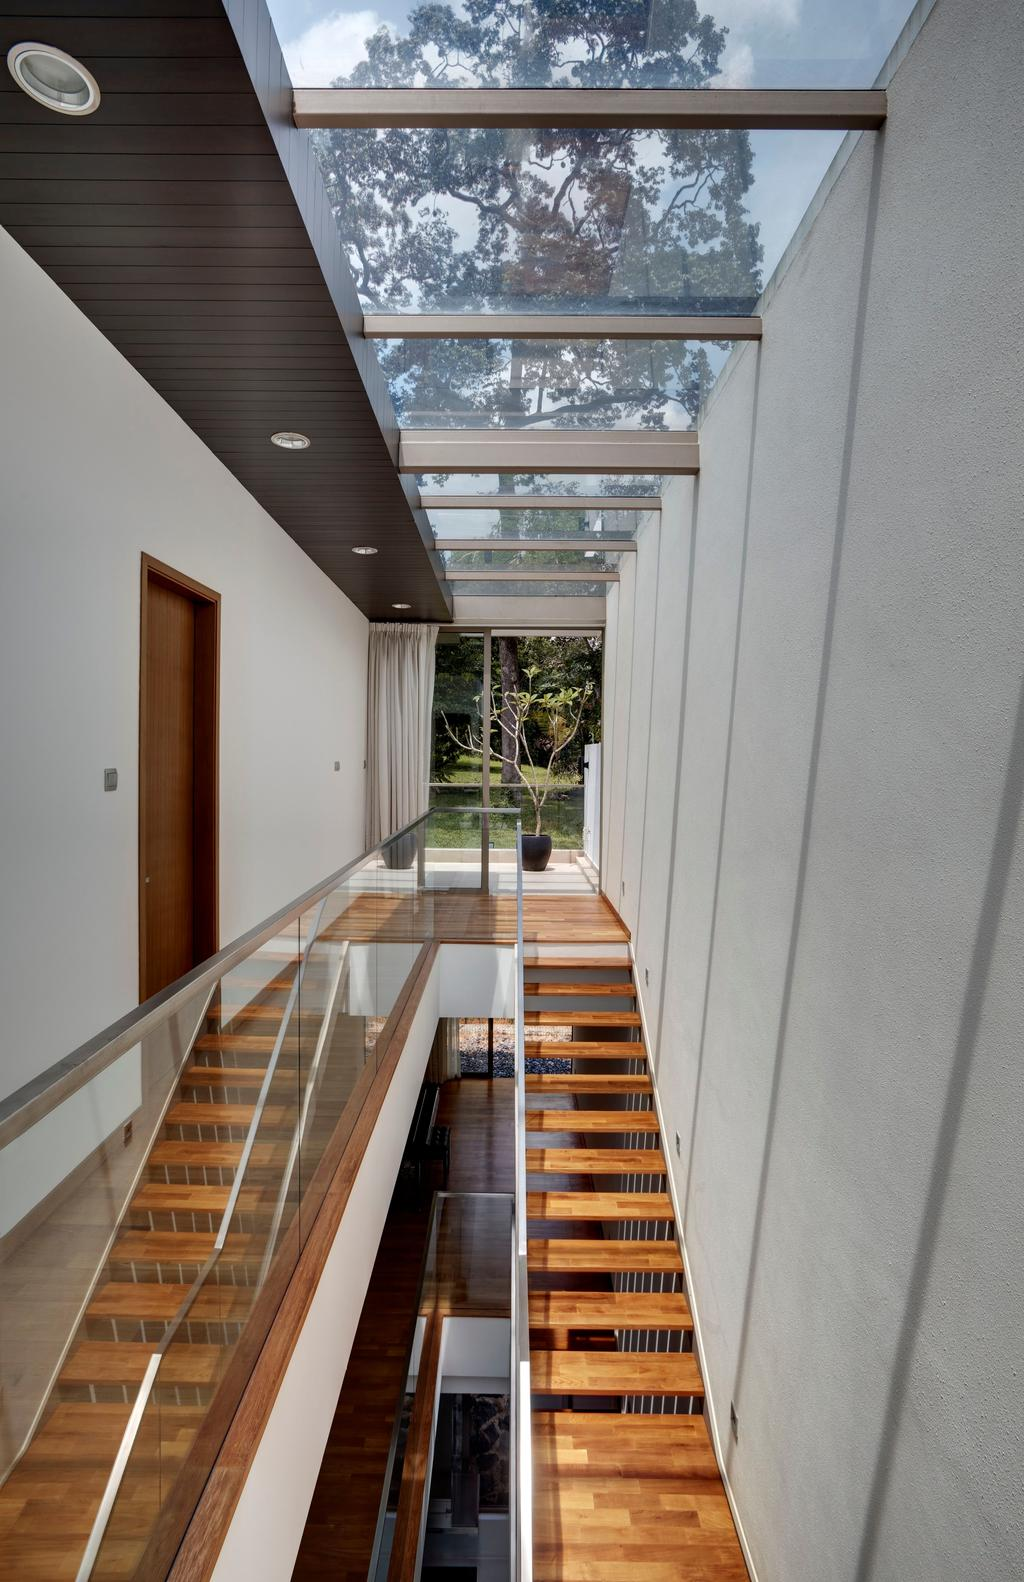 Contemporary, Landed, 115 Ming Teck Park, Architect, Lim Ai Tiong (LATO) Architects, Building, House, Housing, Villa, Corridor